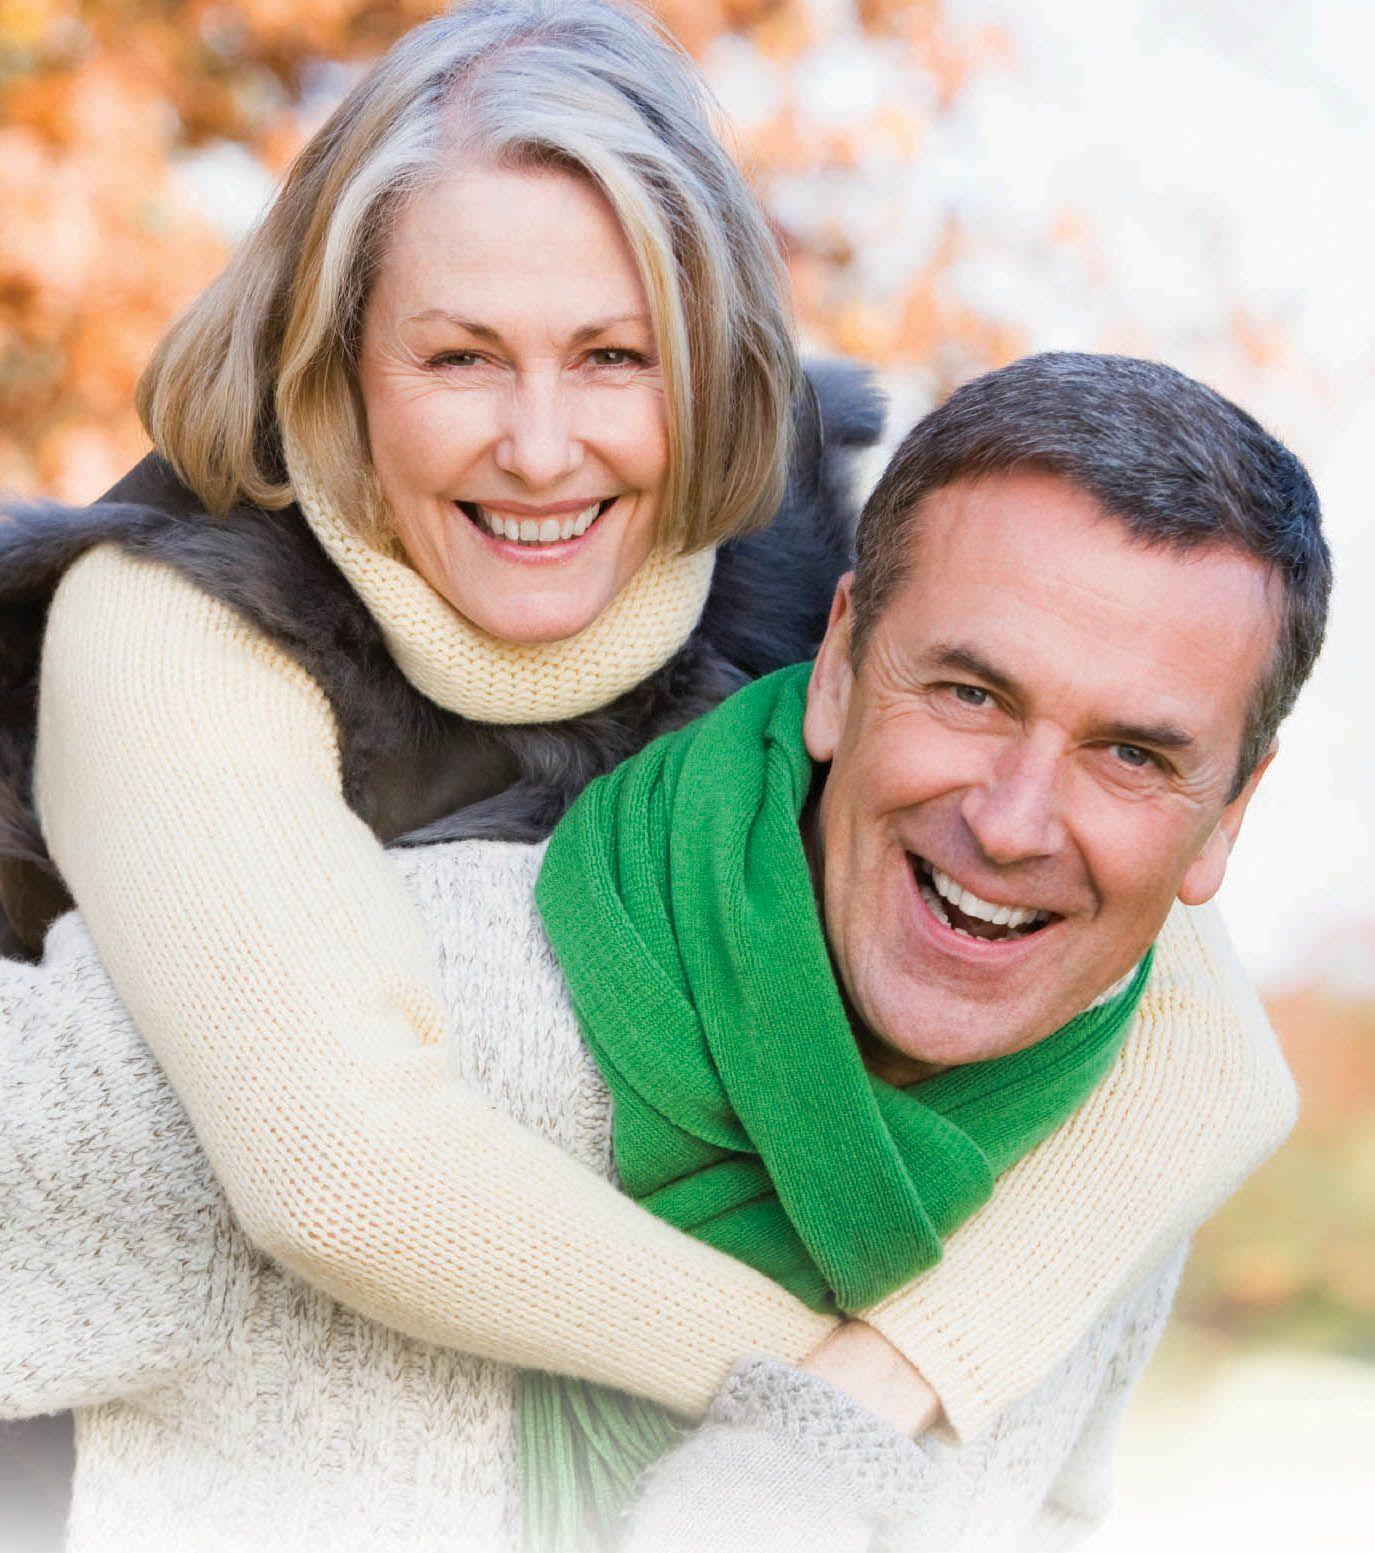 alternative Dating Sites Australia Bengali hastighet dating 2013